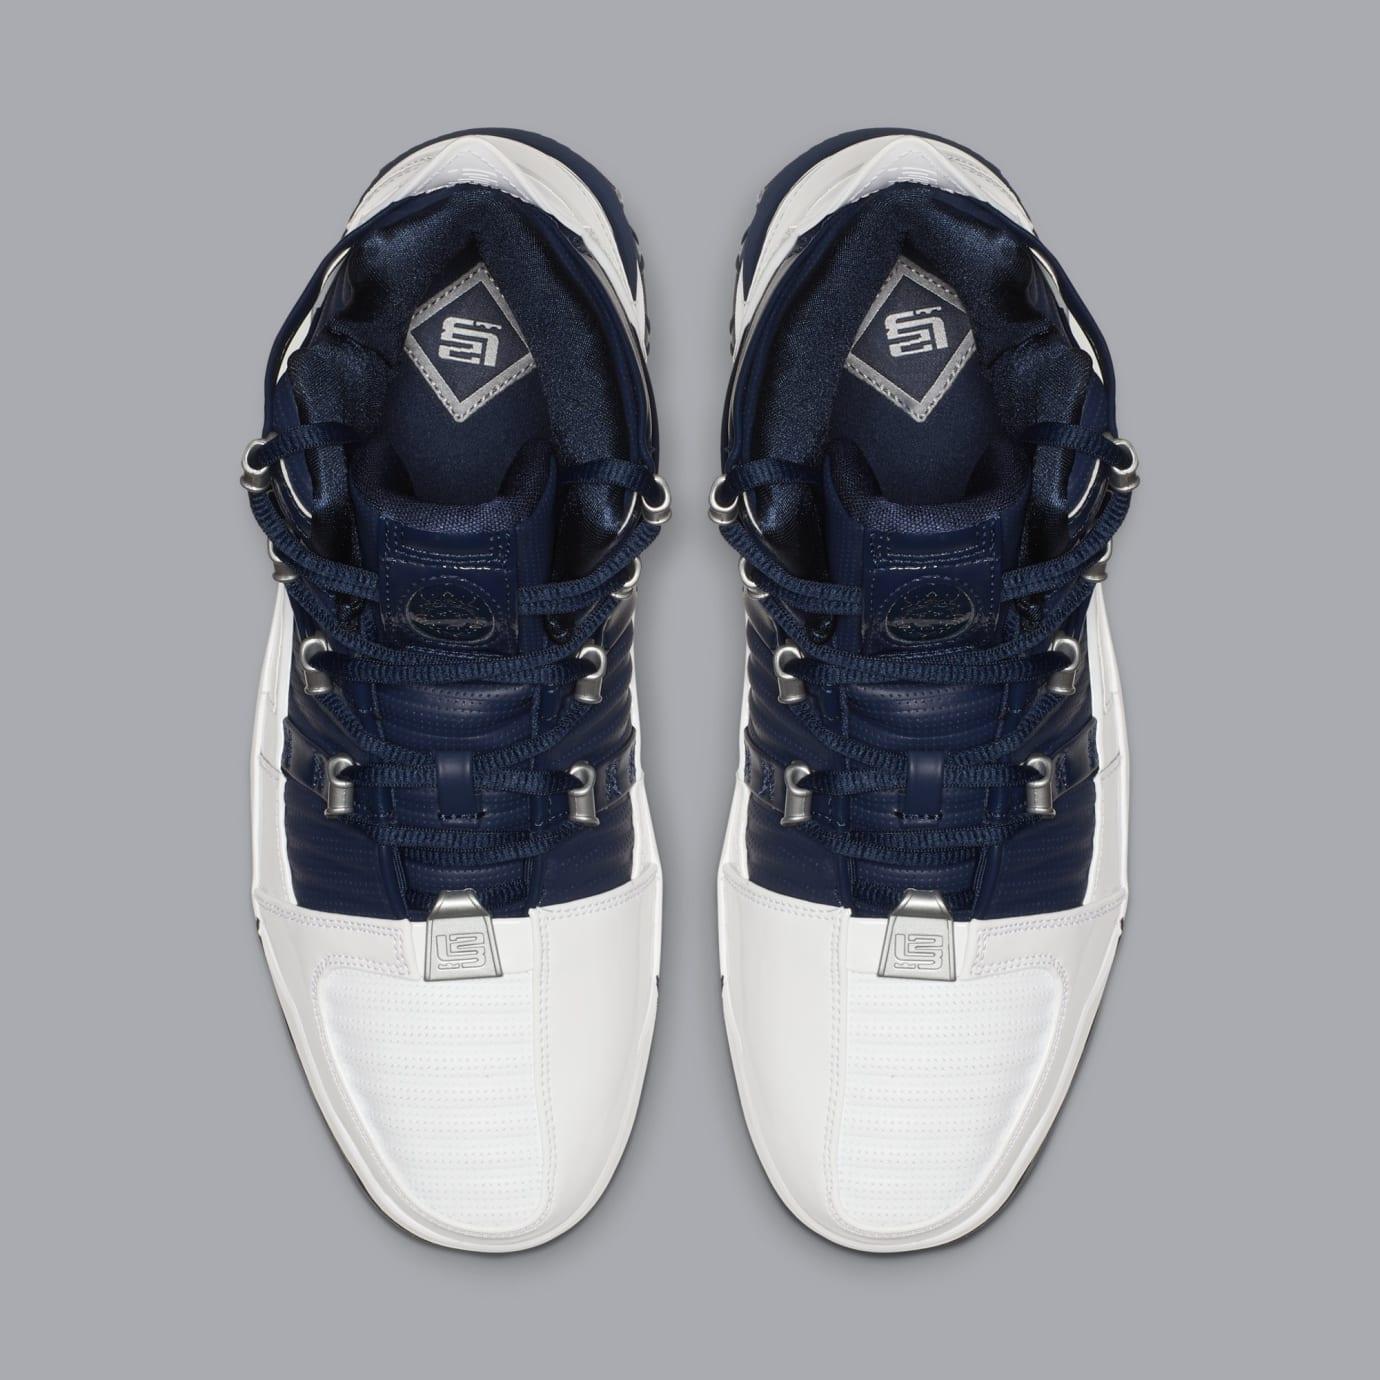 Nike Zoom LeBron 3 'White/Navy Blue/Silver' AO2434-103 (Top)